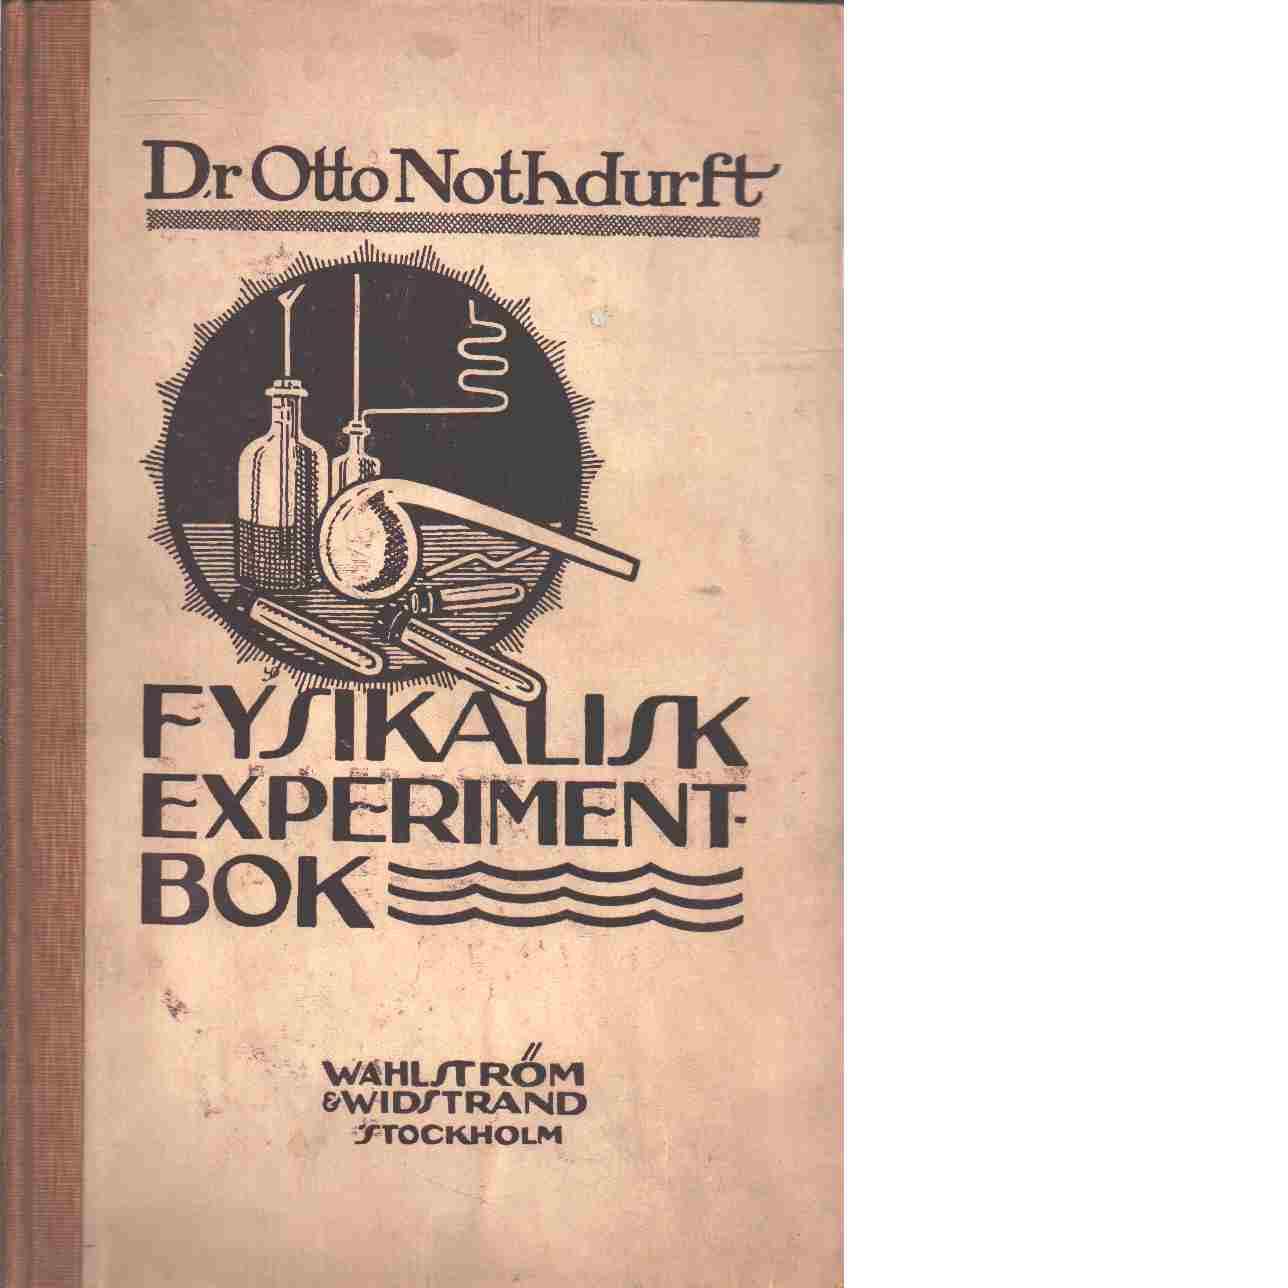 Fysikalisk experimentbok - Nothdurft, Otto